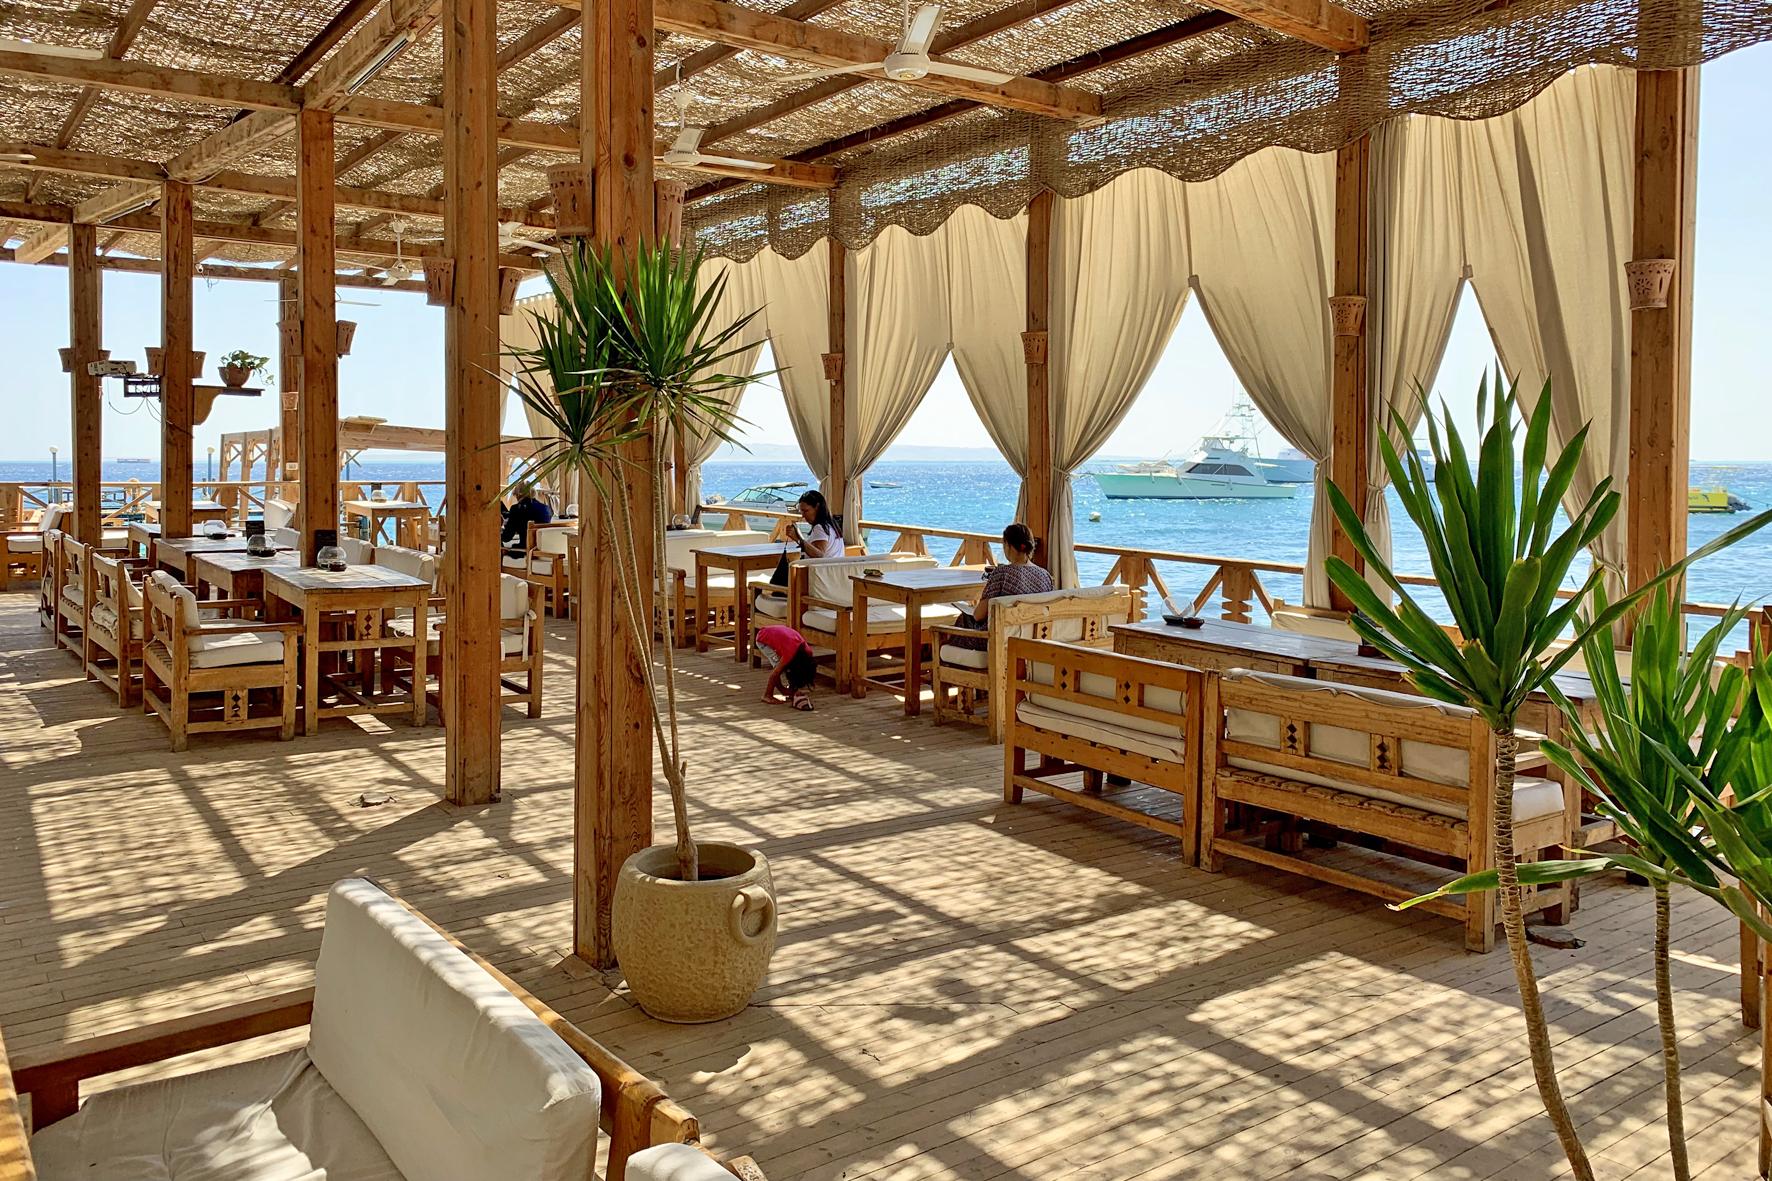 Best restaurants in Hurghada